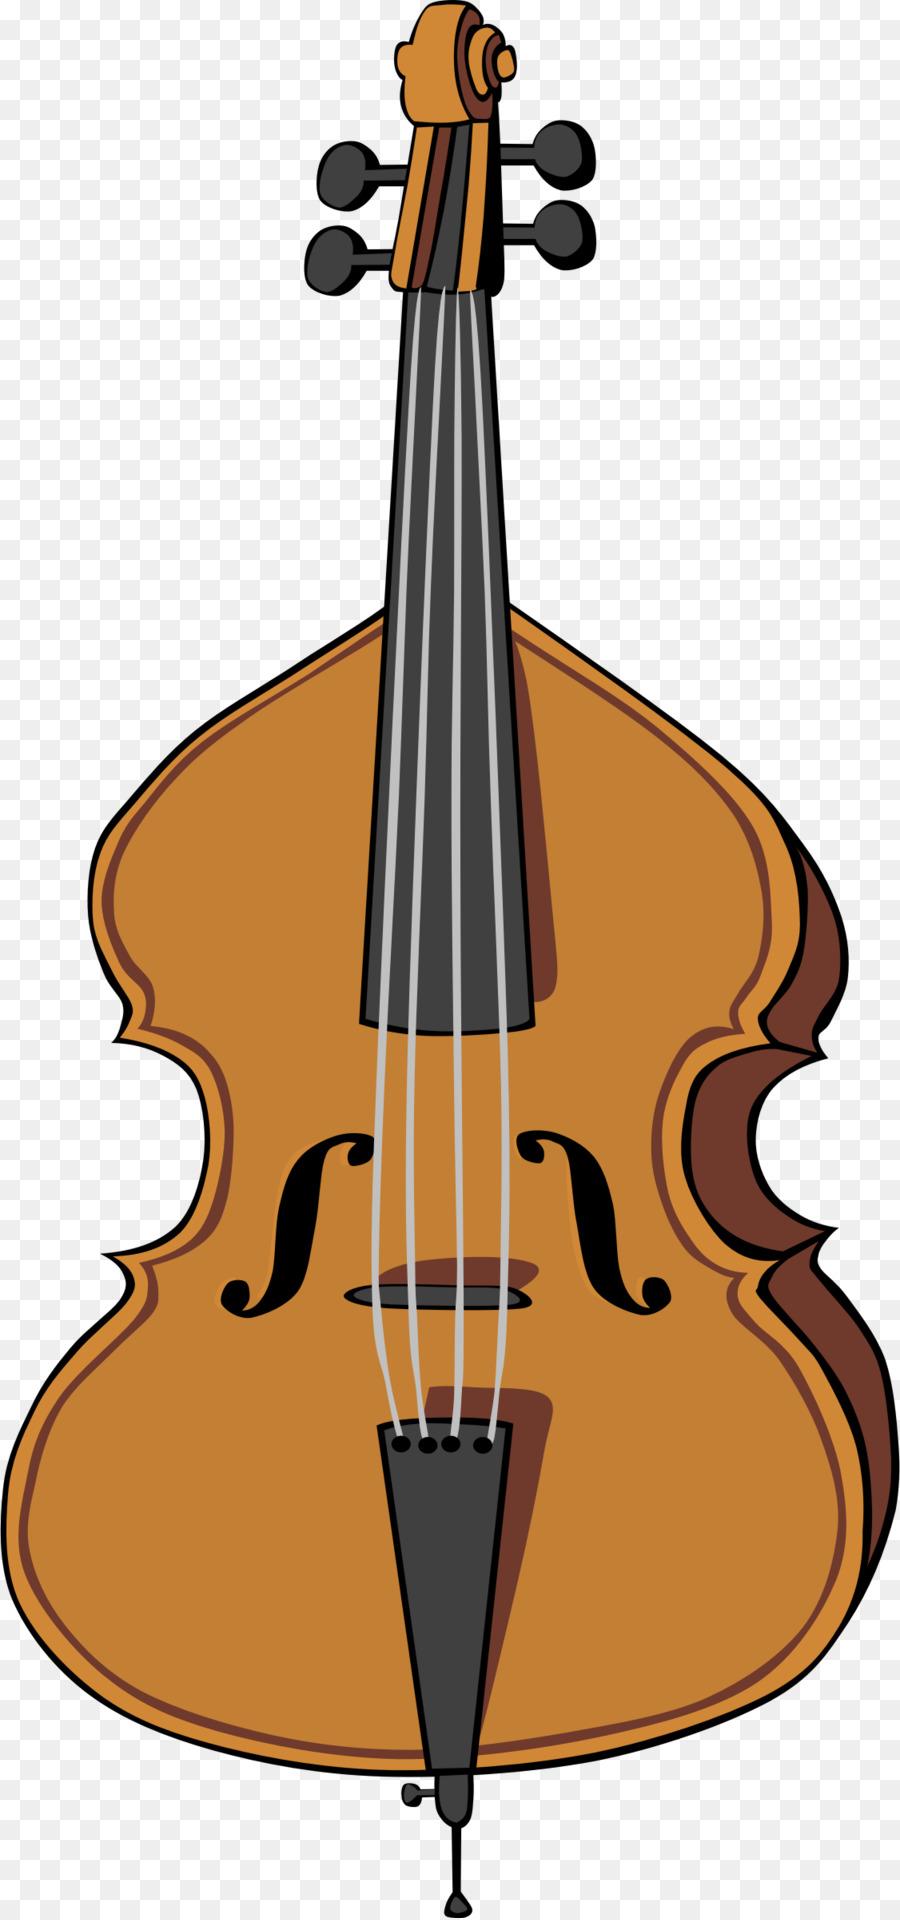 Cello clipart cartoon. Violin graphics transparent clip